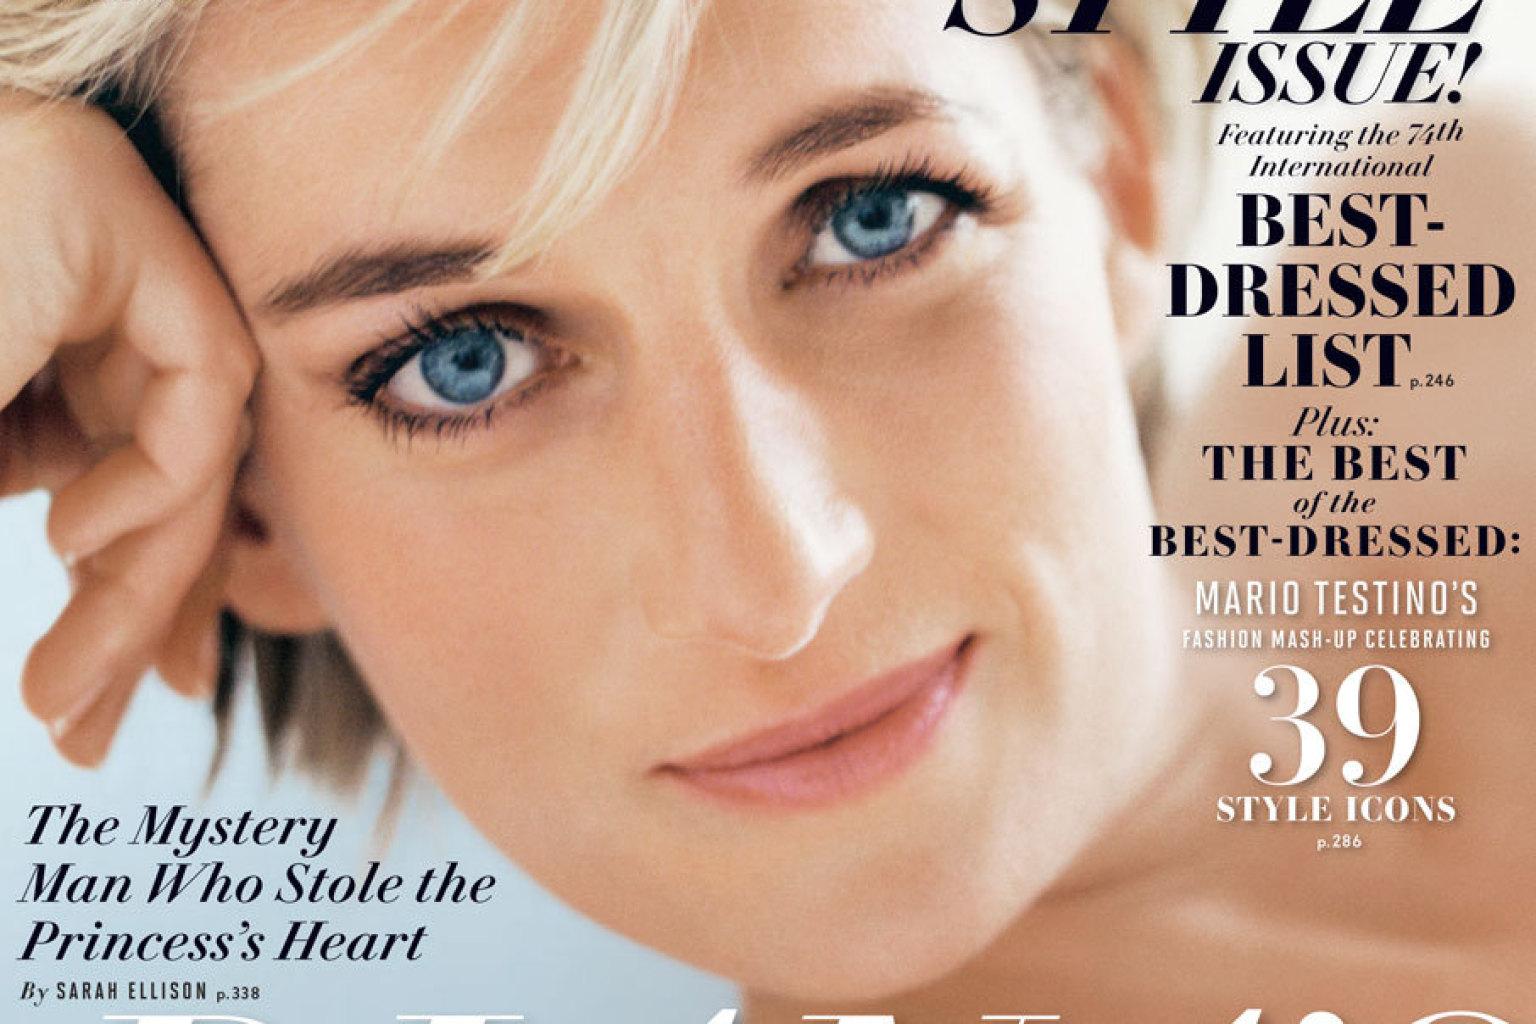 Princess Diana Covers Vanity Fair September 2013 Issue (PHOTO)